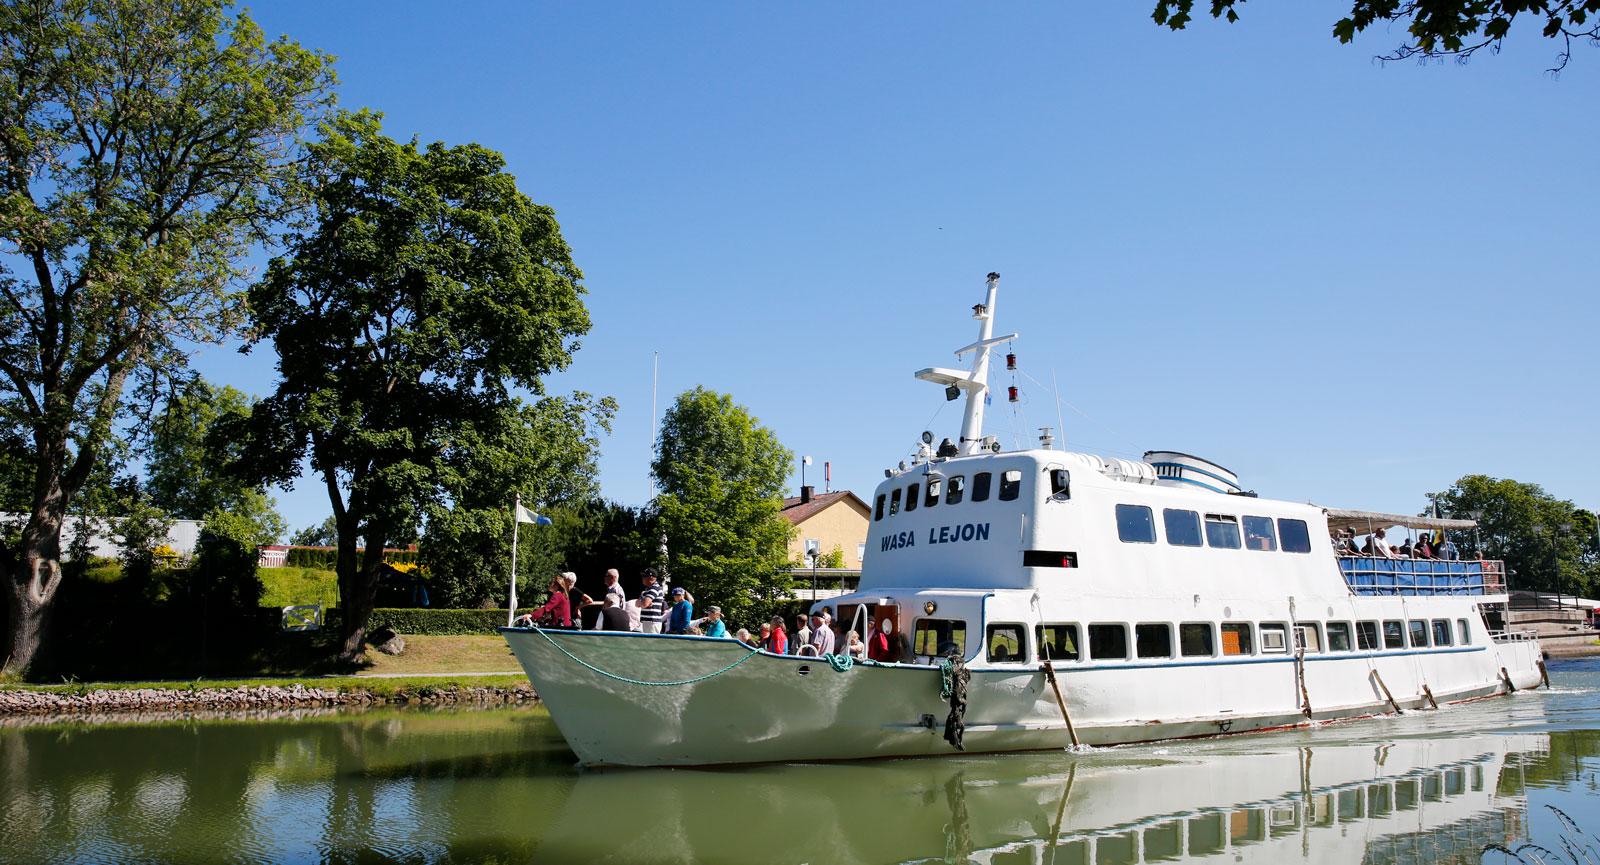 Njut av en kryssning till Borensberg ombord på M/S Wasa Lejon.